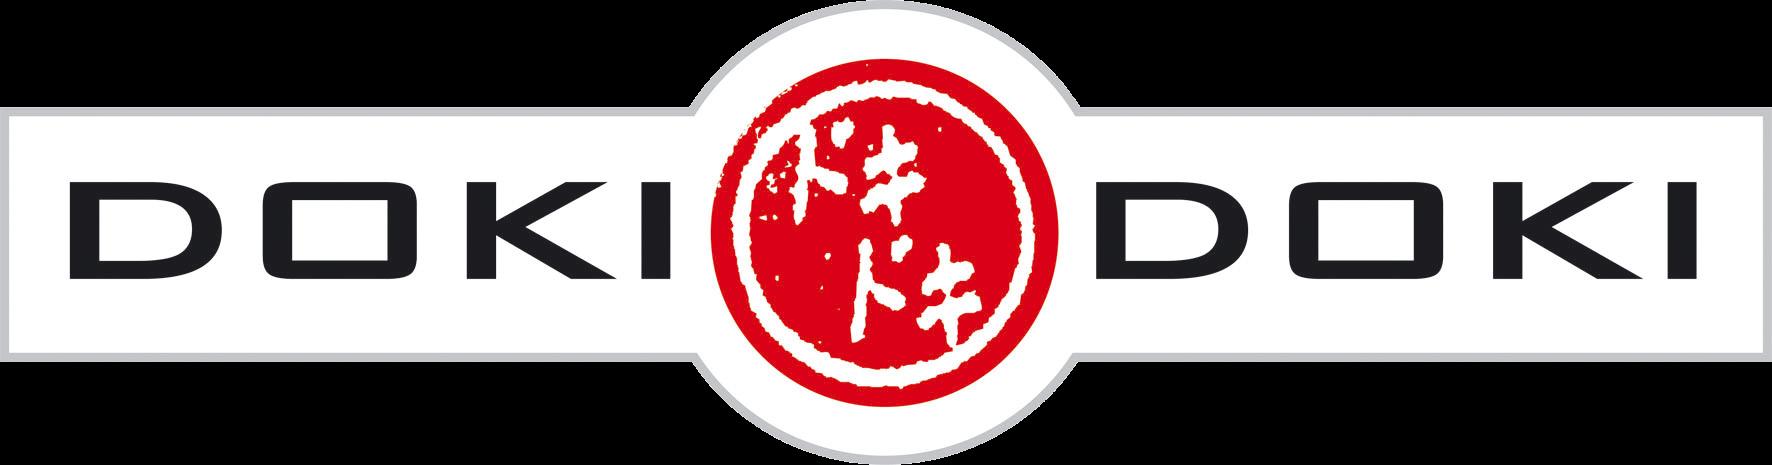 Fichier:Logo Doki Doki.png — Wikipédia